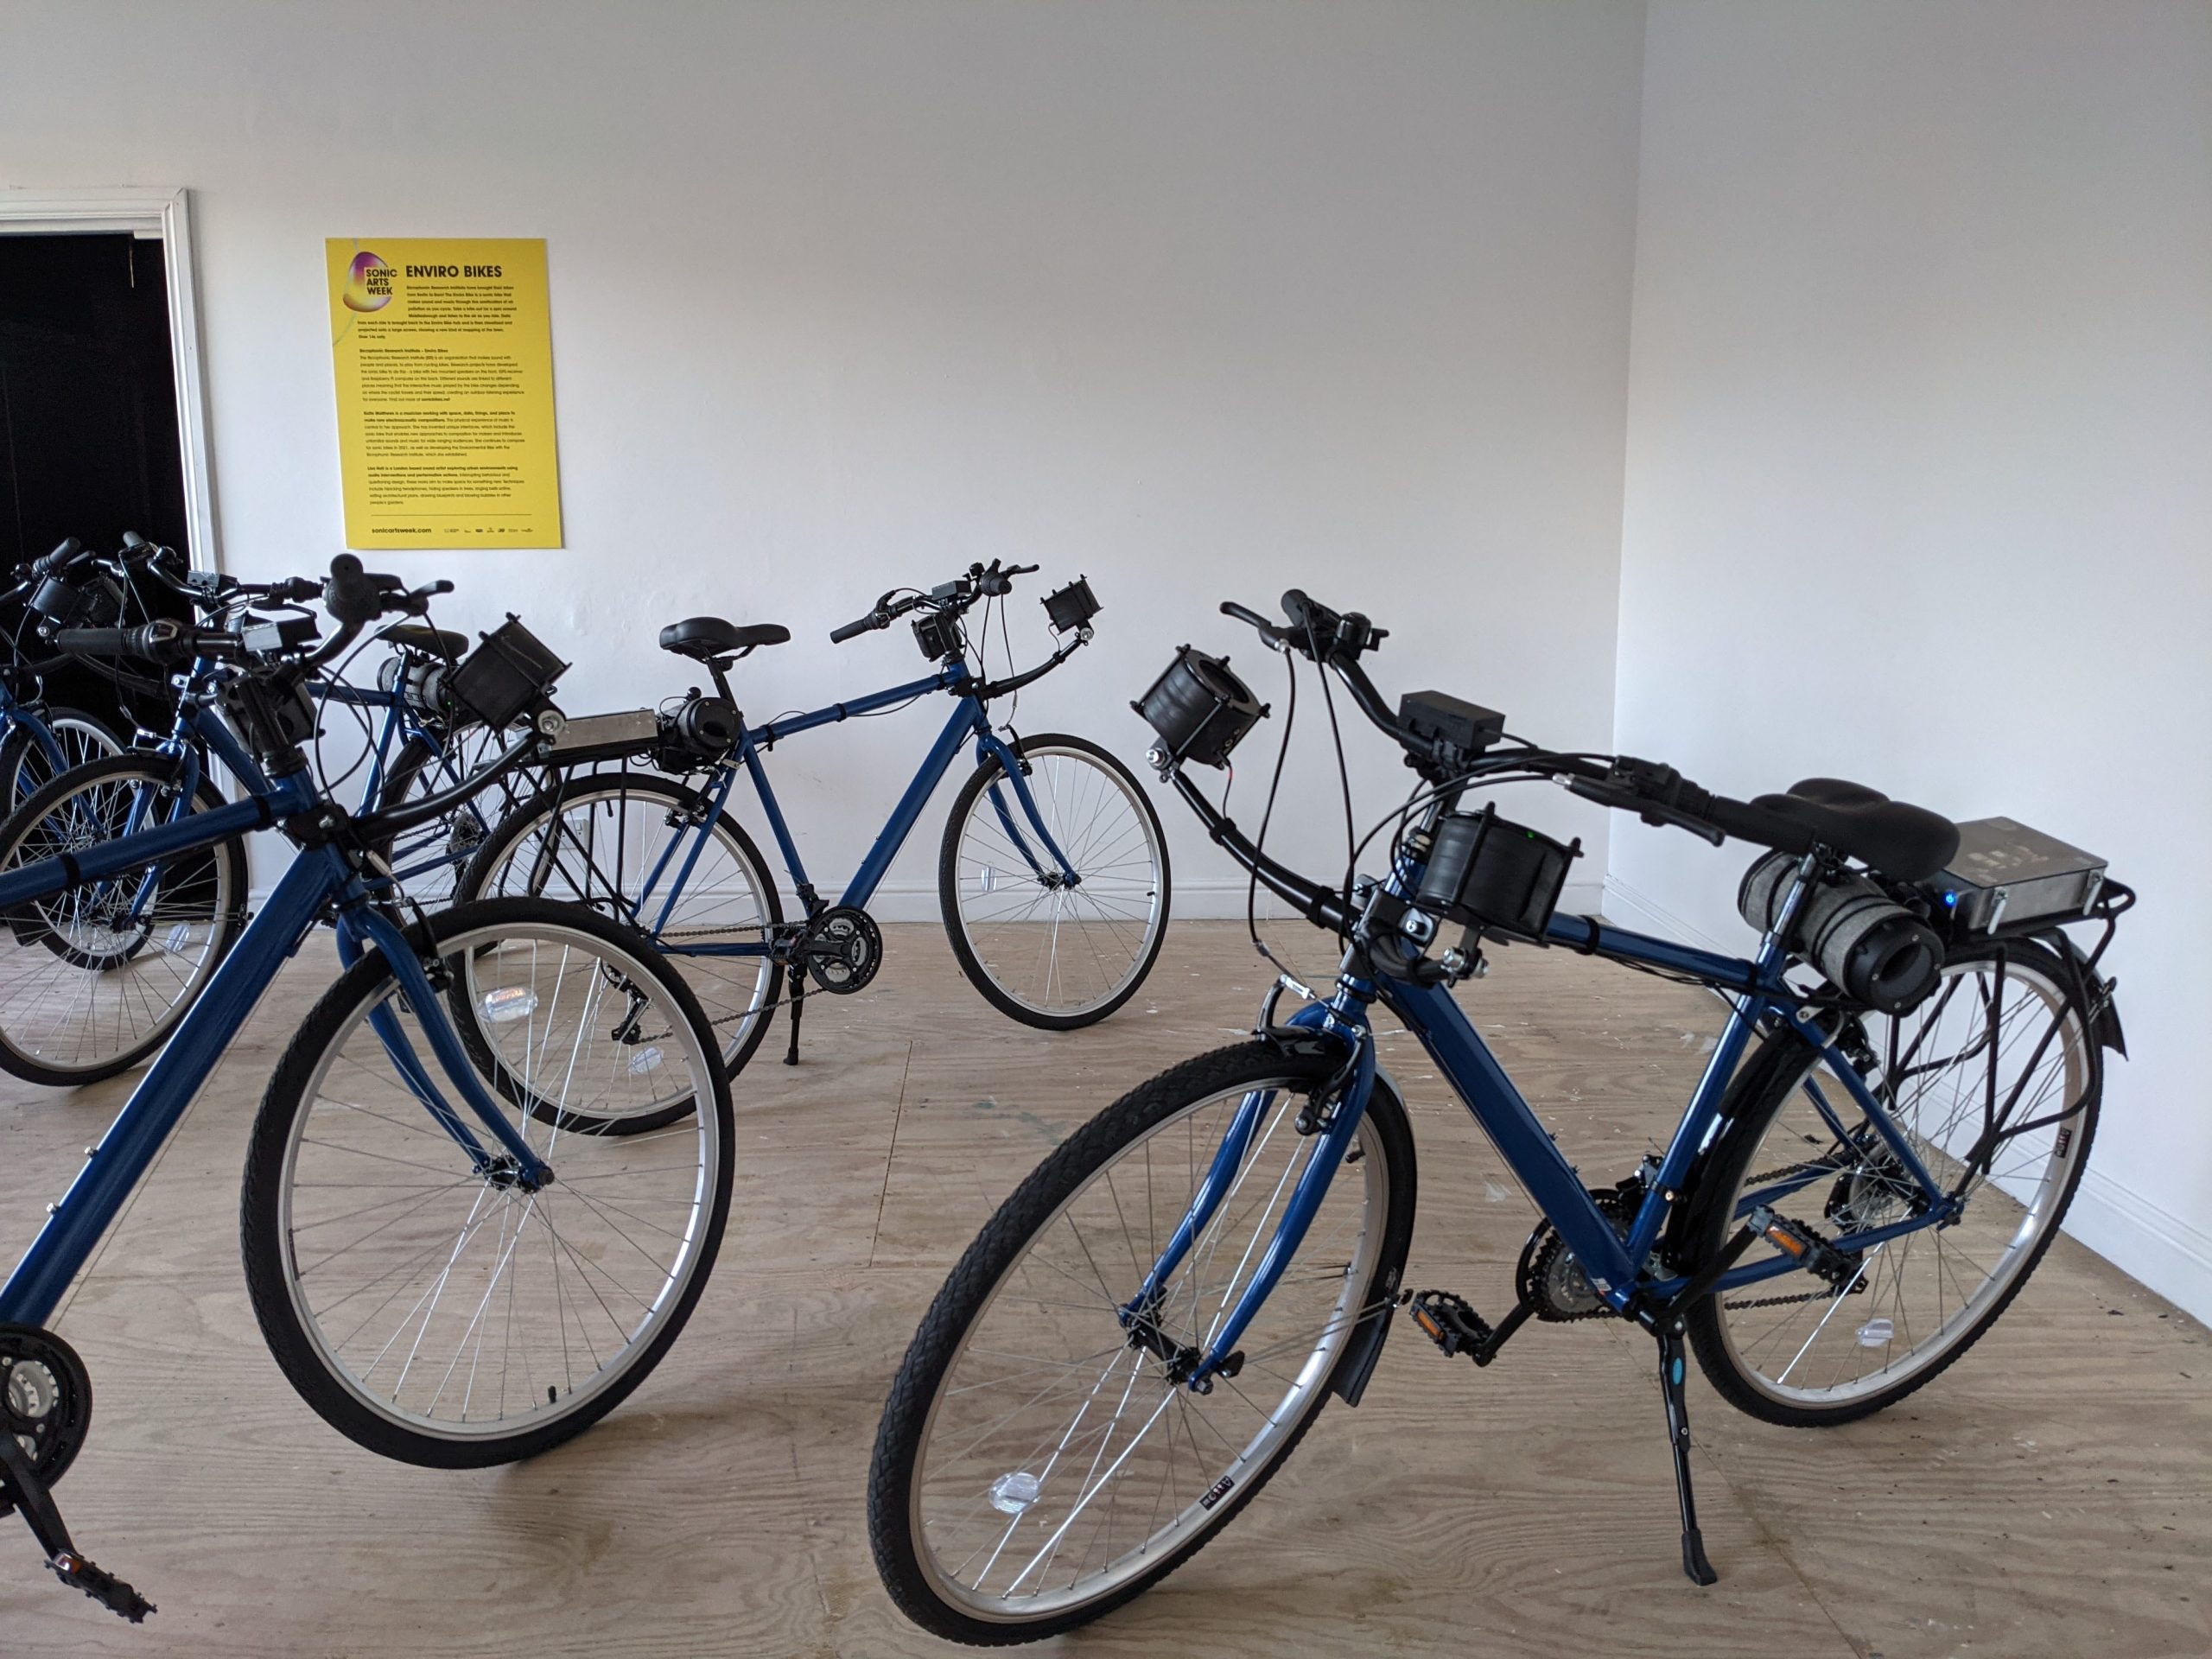 Enviro Bikes in Auxiliary Gallery